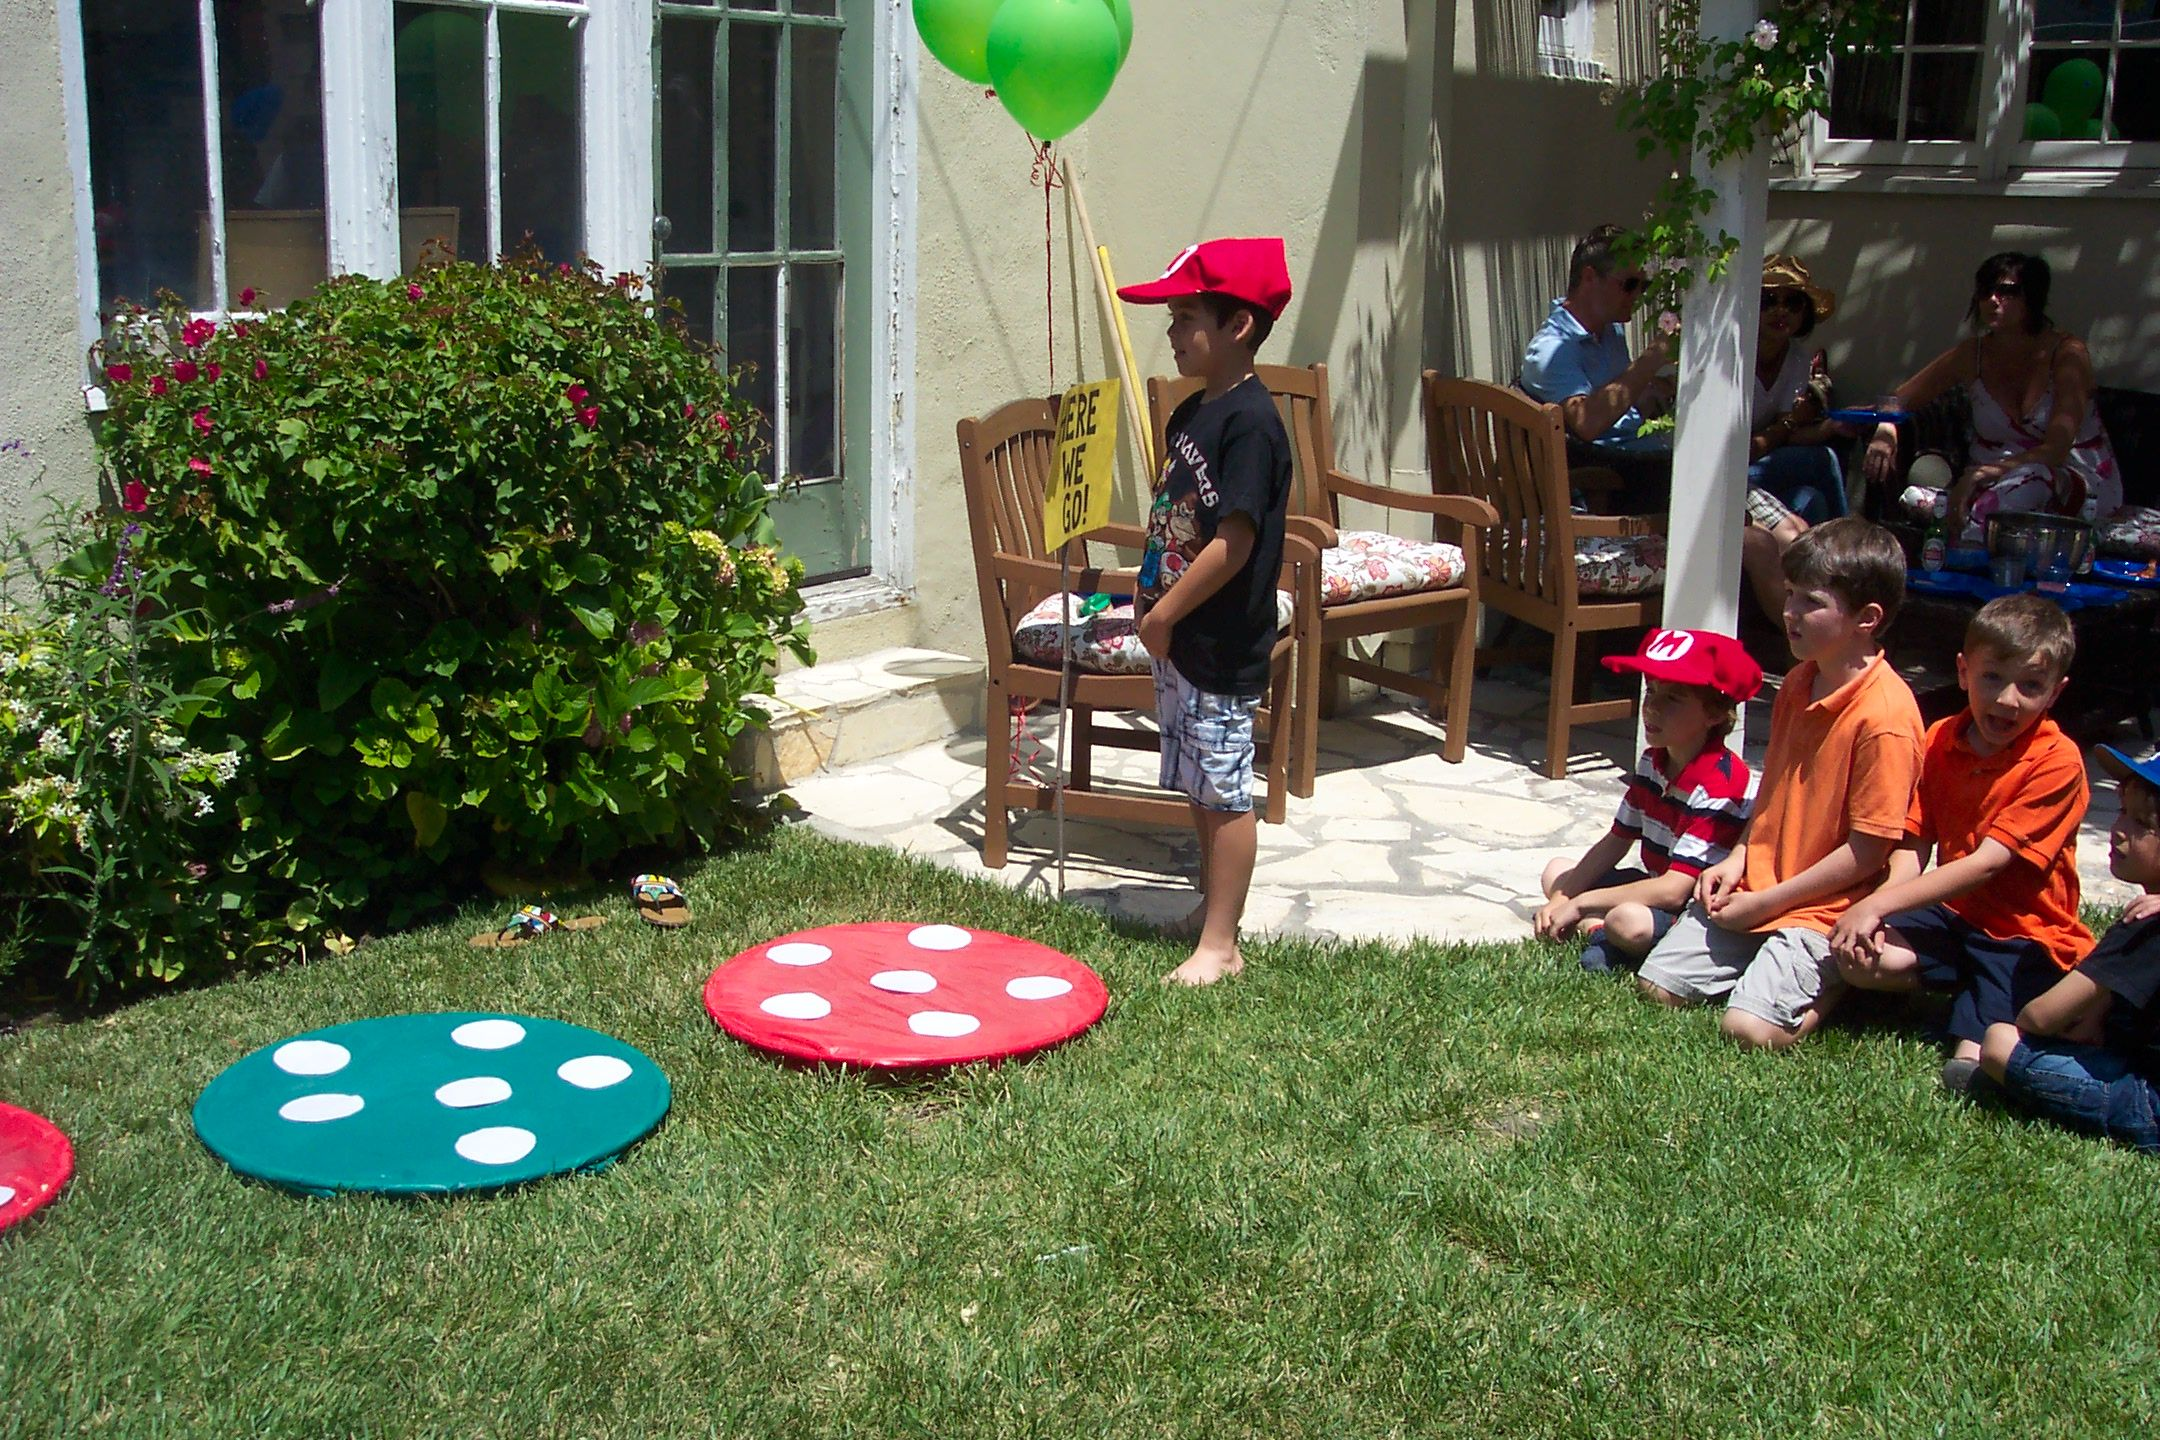 Super Mario Birthday Mario Birthday Party 10th Birthday Parties Fourth Birthday Birthday Party Ideas Kid Birthdays 4th Birthday